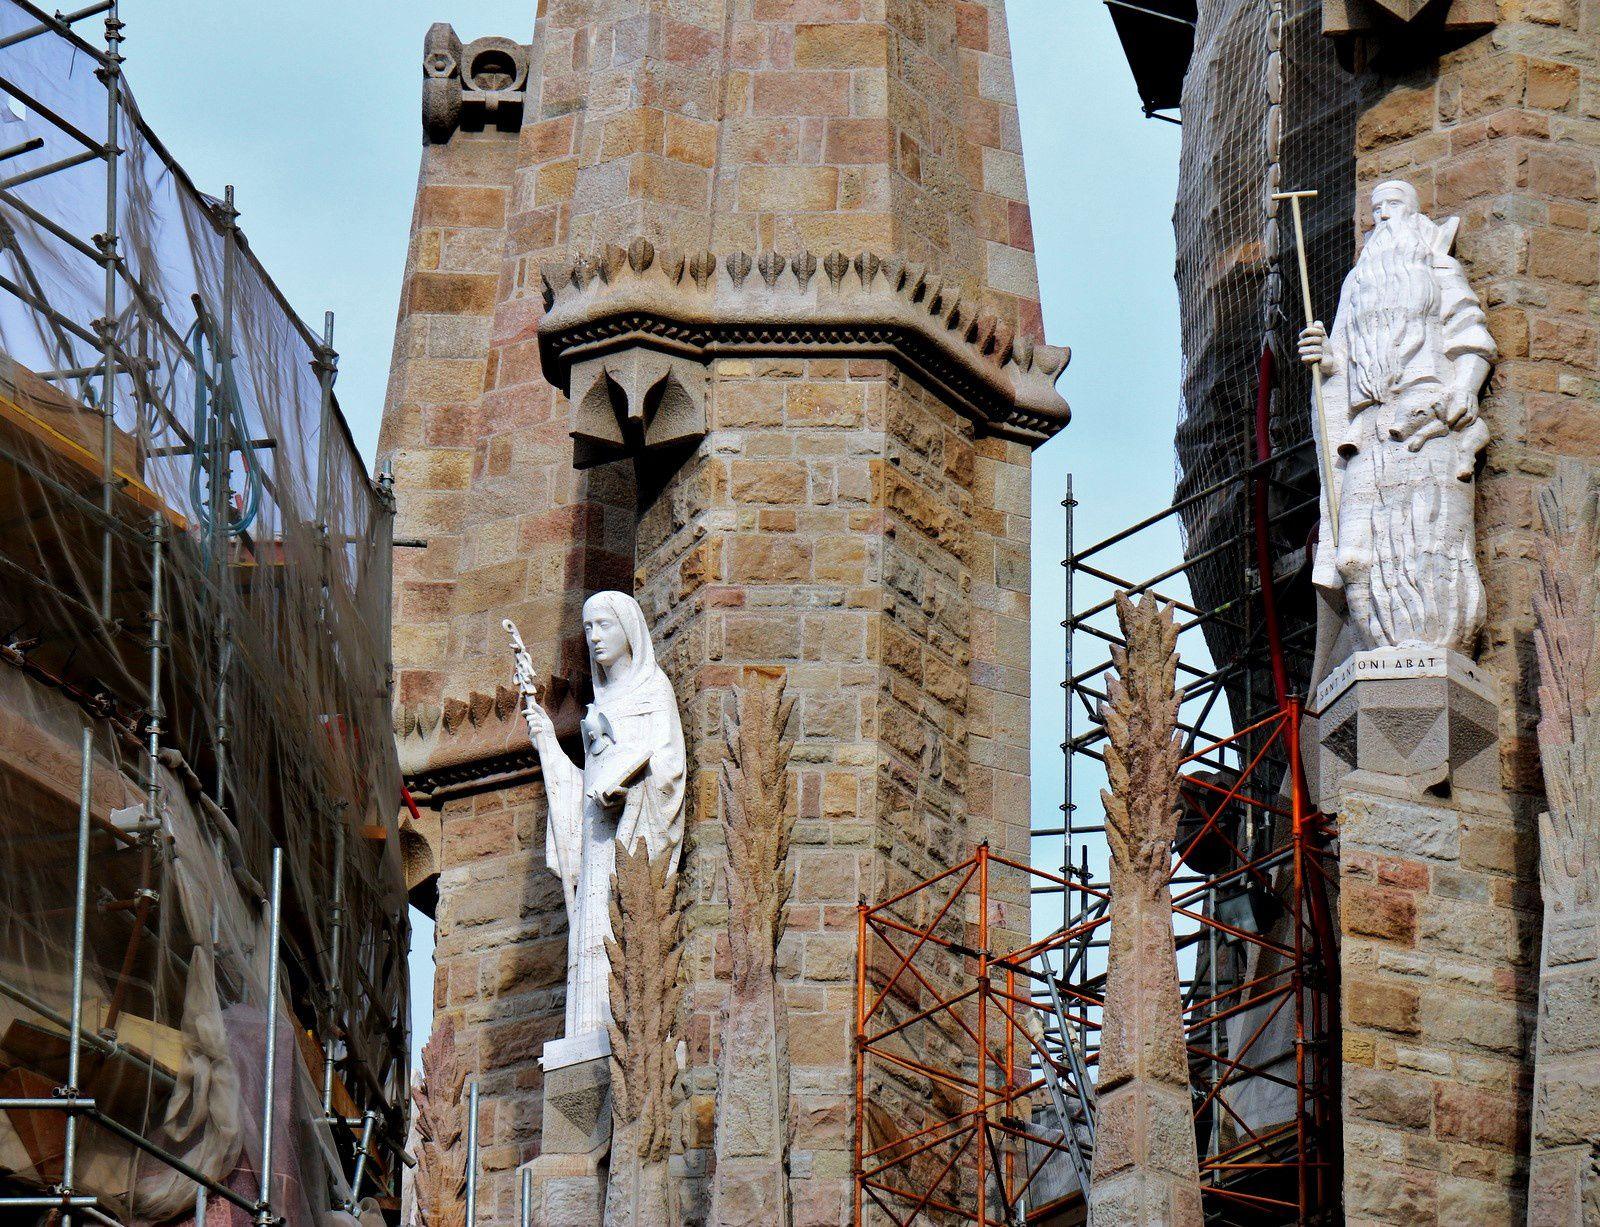 Saint Antoine et Sainte Scolastique